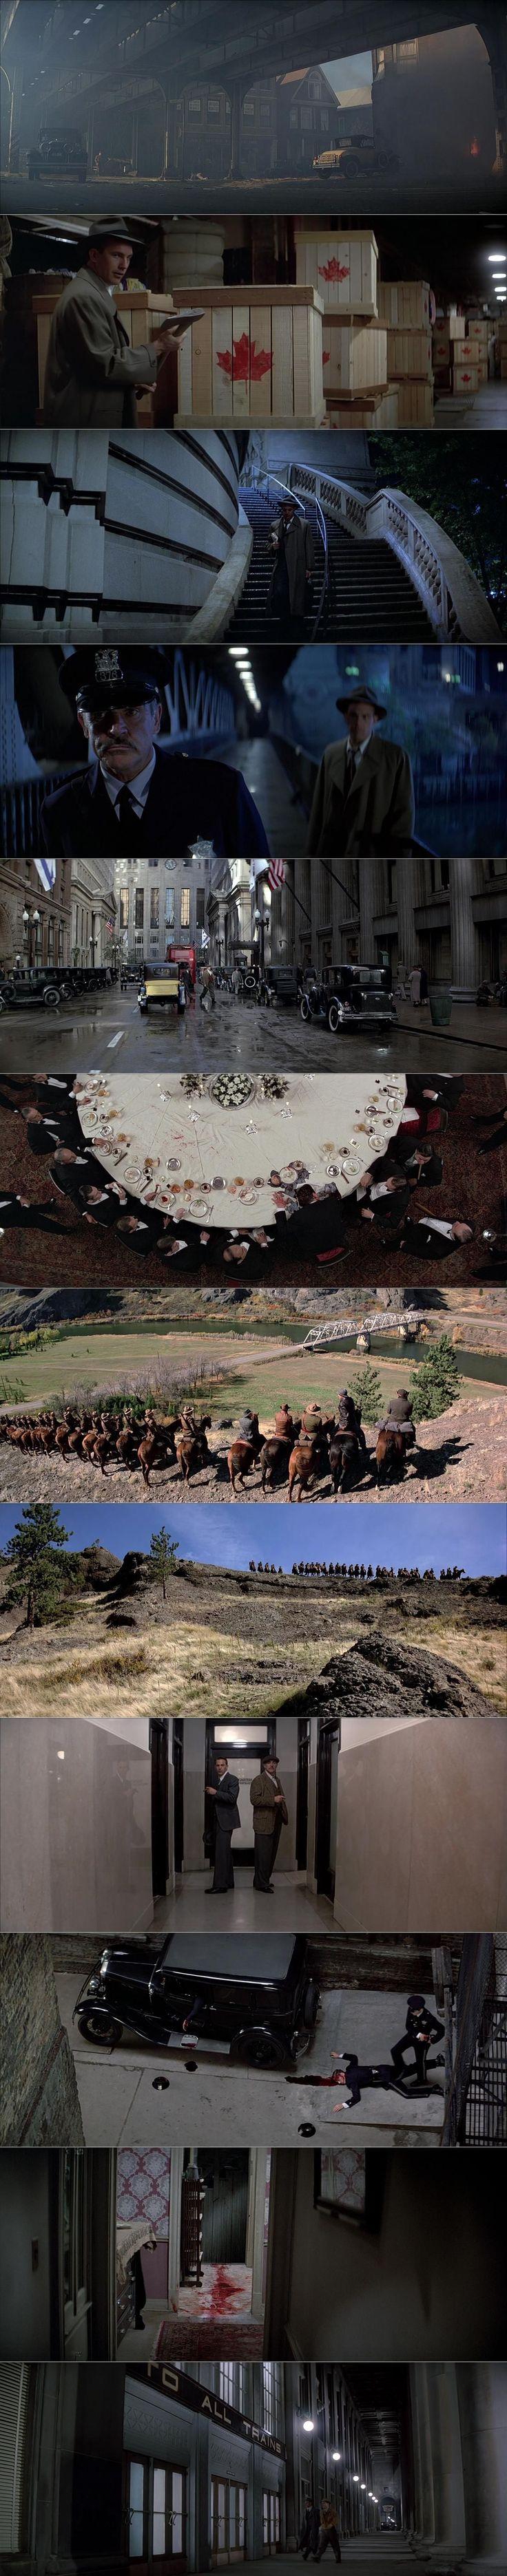 The Untouchables (1987) | Cinematography by Stephen H. Burum | Directed by Brian De Palma #DigitalFilmSchool